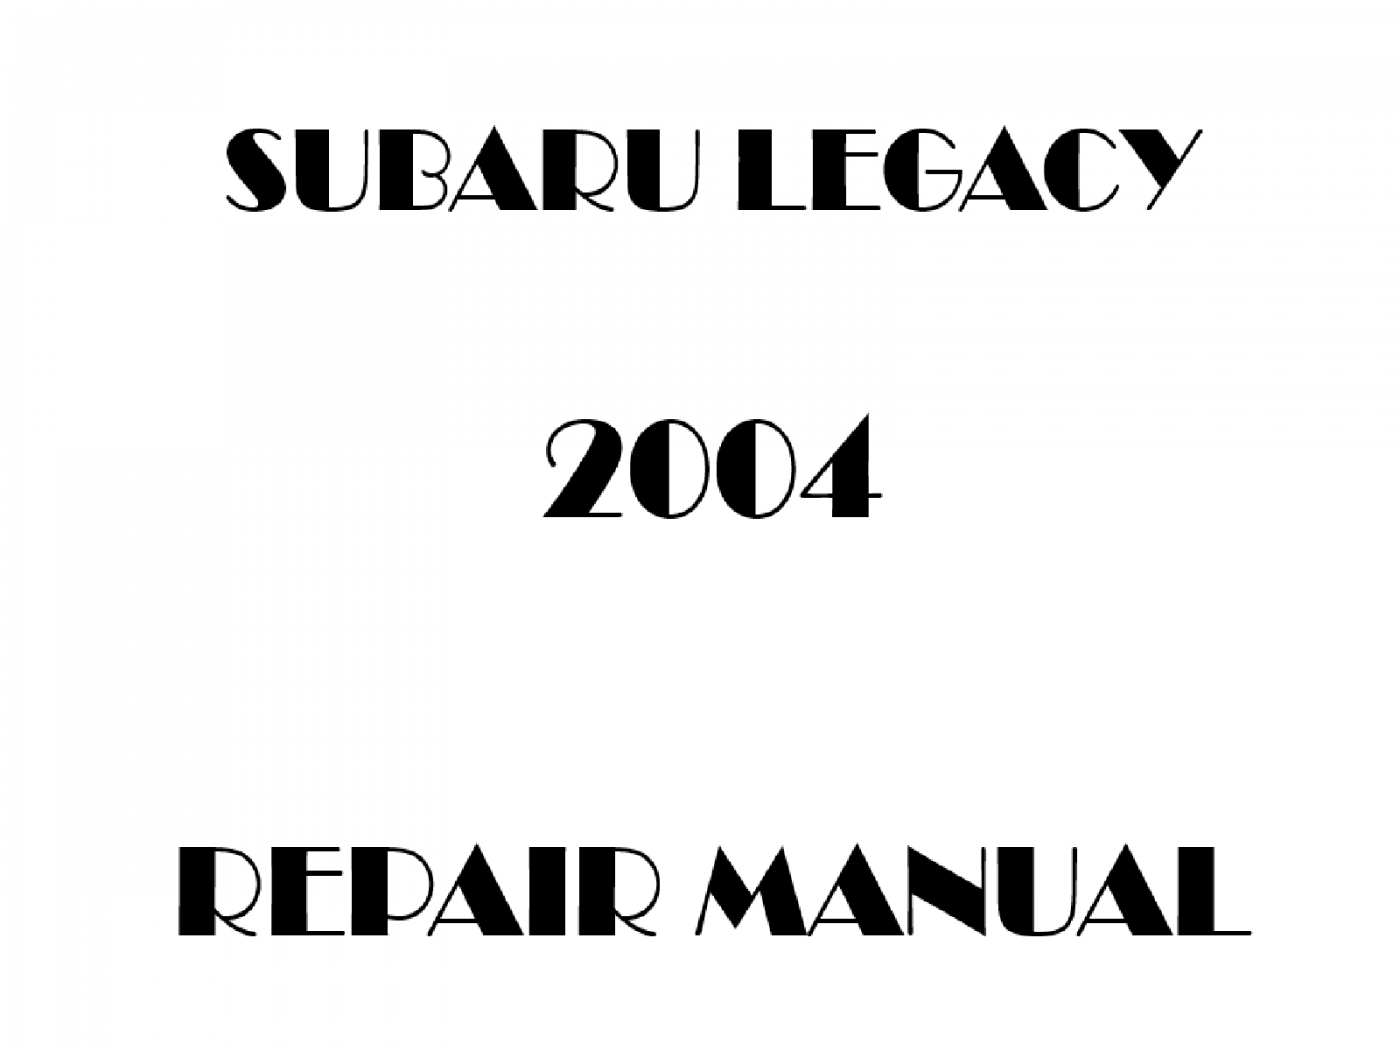 2004 Subaru Legacy repair manual